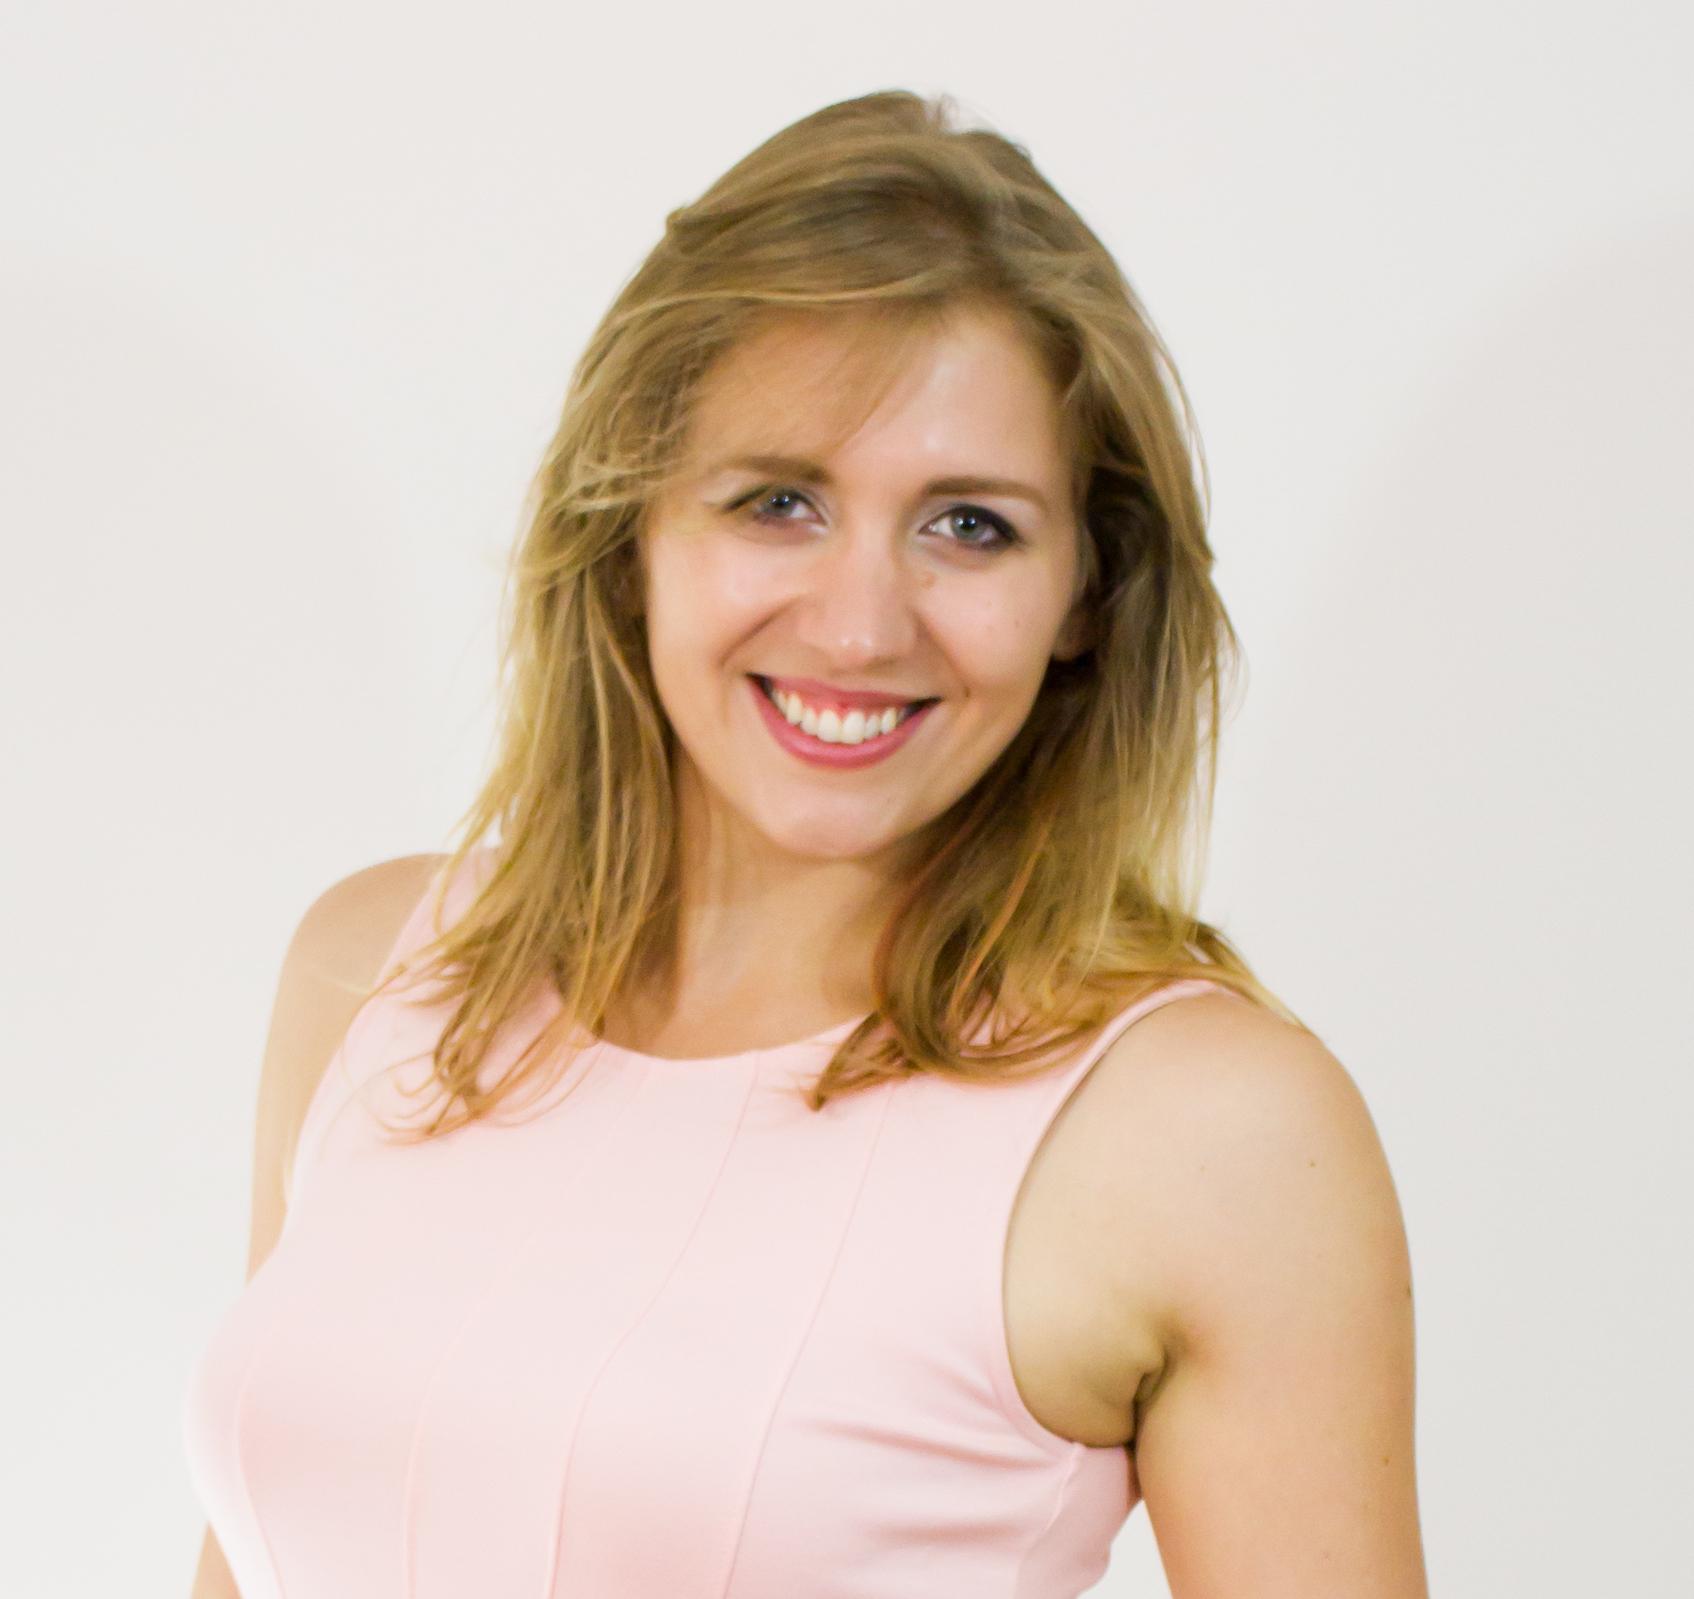 Headshot of Brittney O'Neill